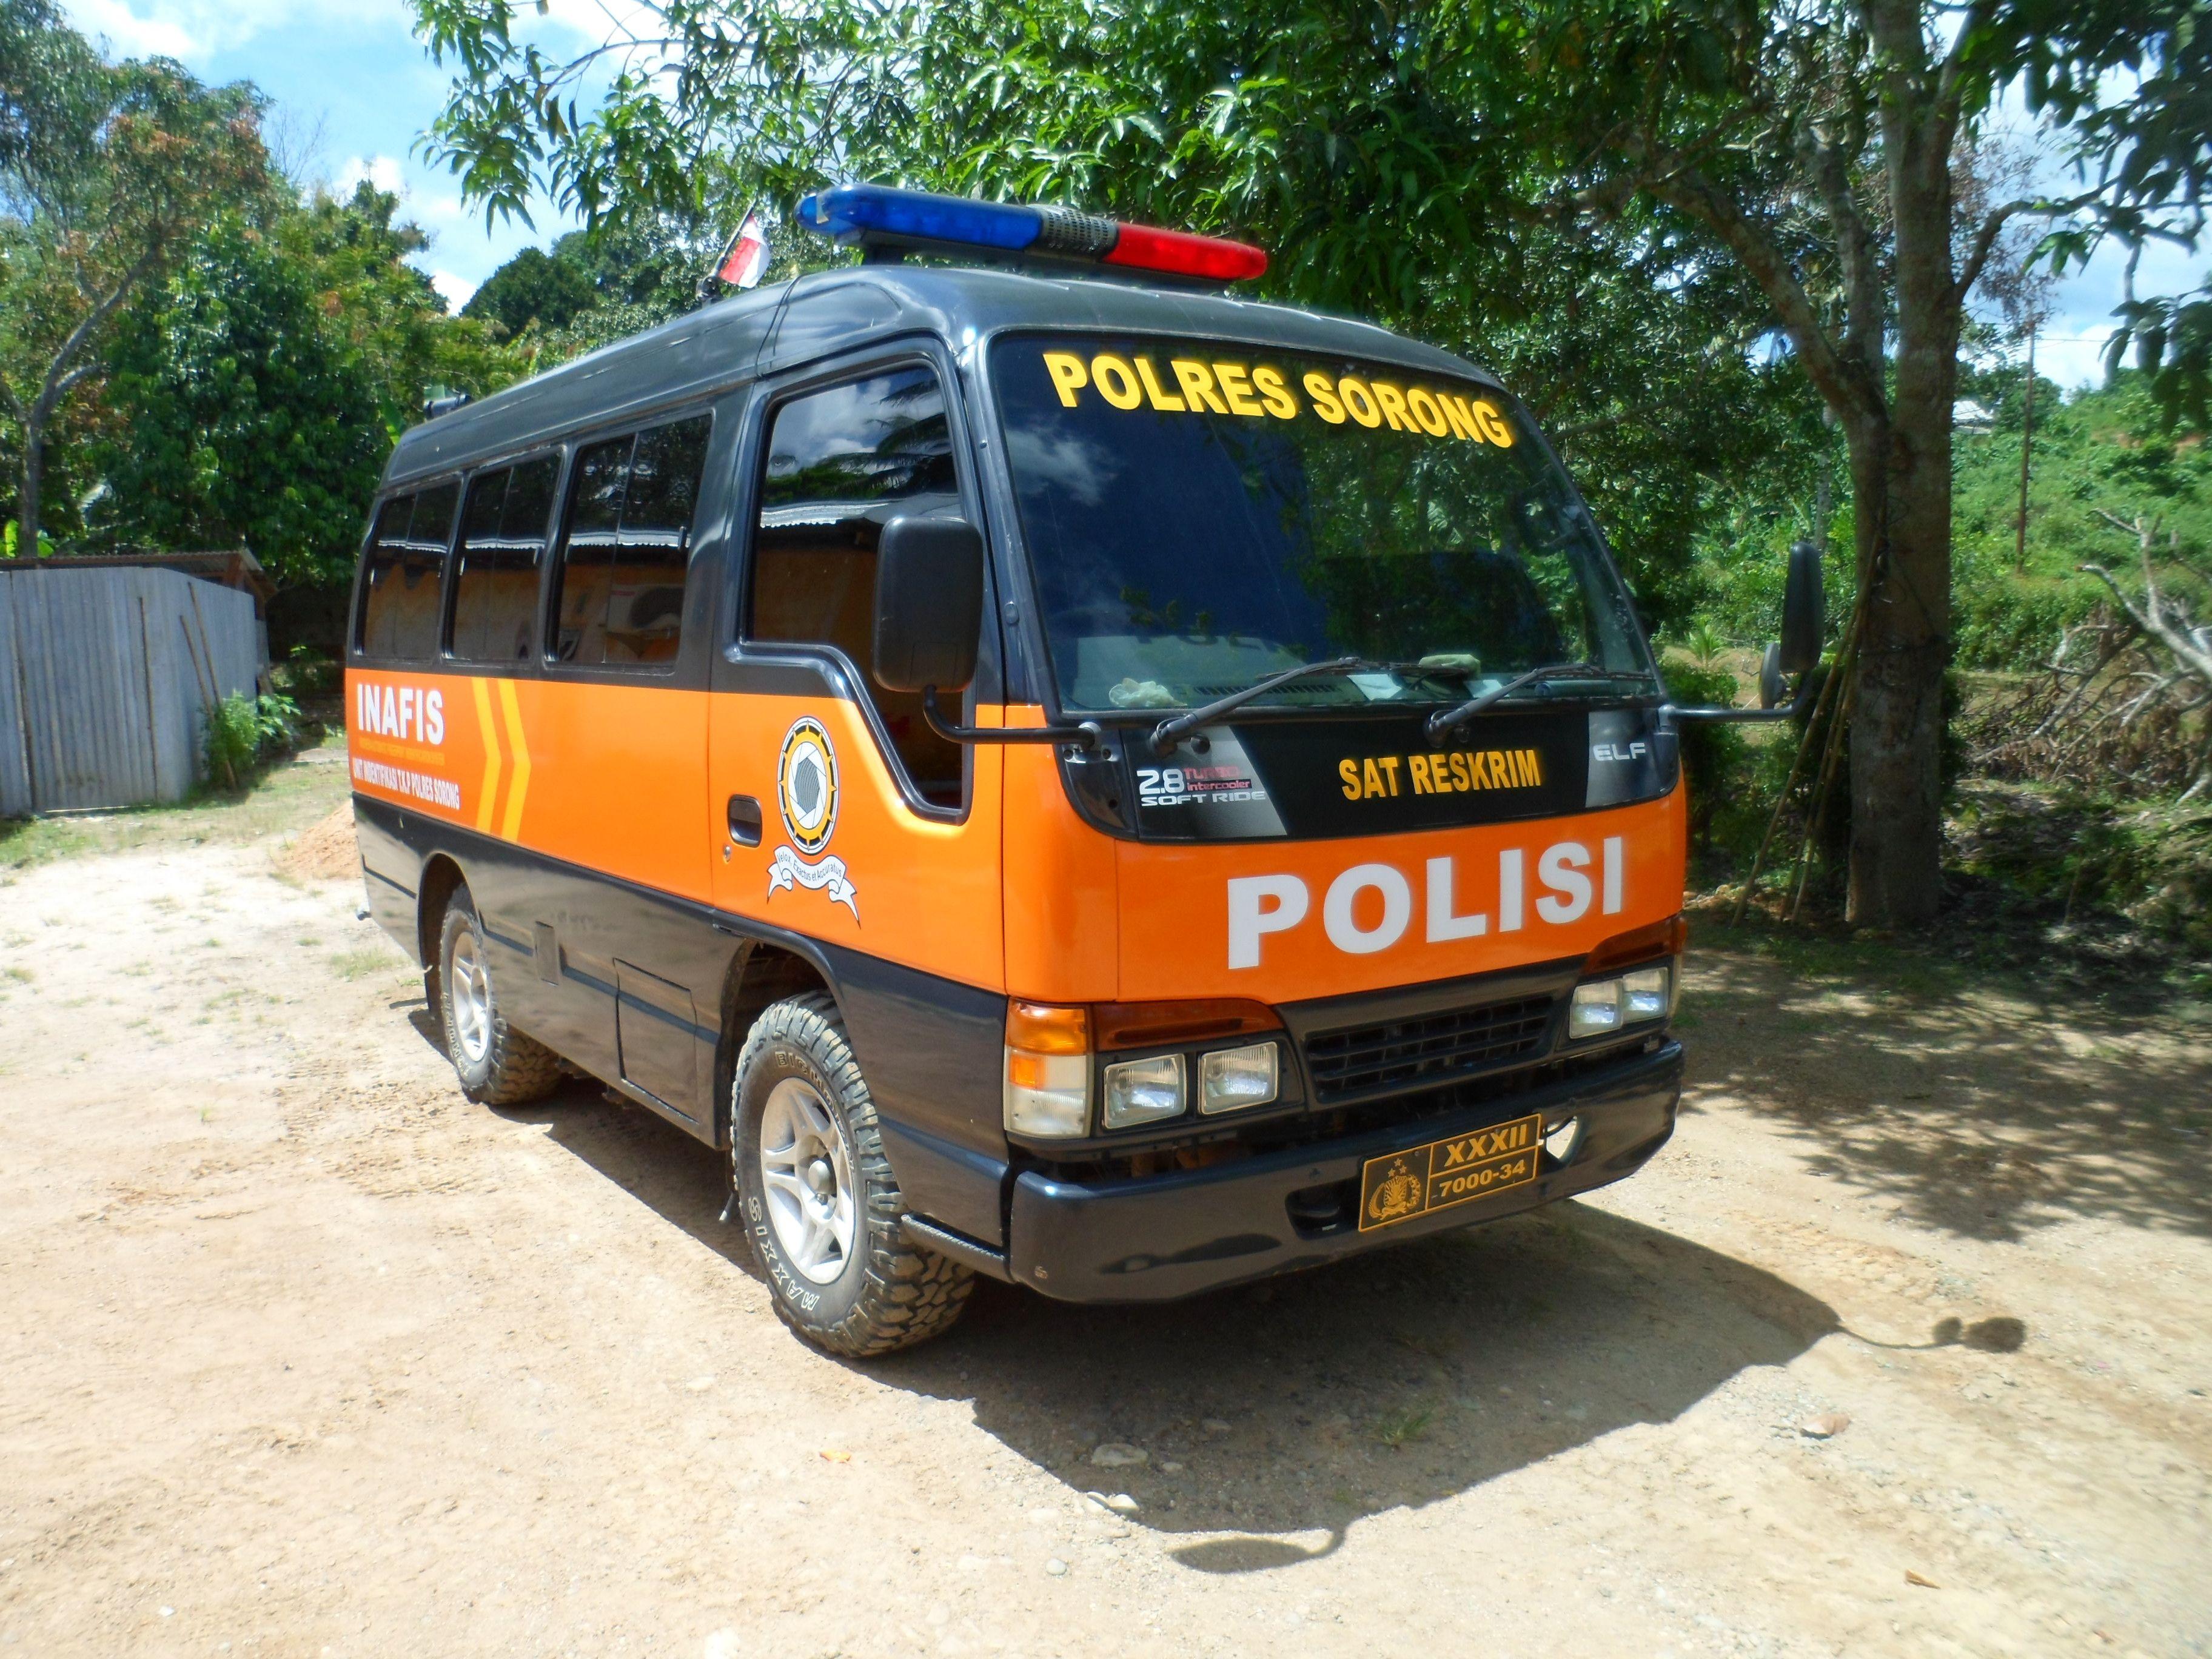 Sticker Mobil Sorong Sticker Mobil Inafis Polres Sorong Tribal Graphics Jln Trikora Transad Aimas Kab Sorong Papua Barat Call Sms Wa 0852 54 Modifikasi Mobil